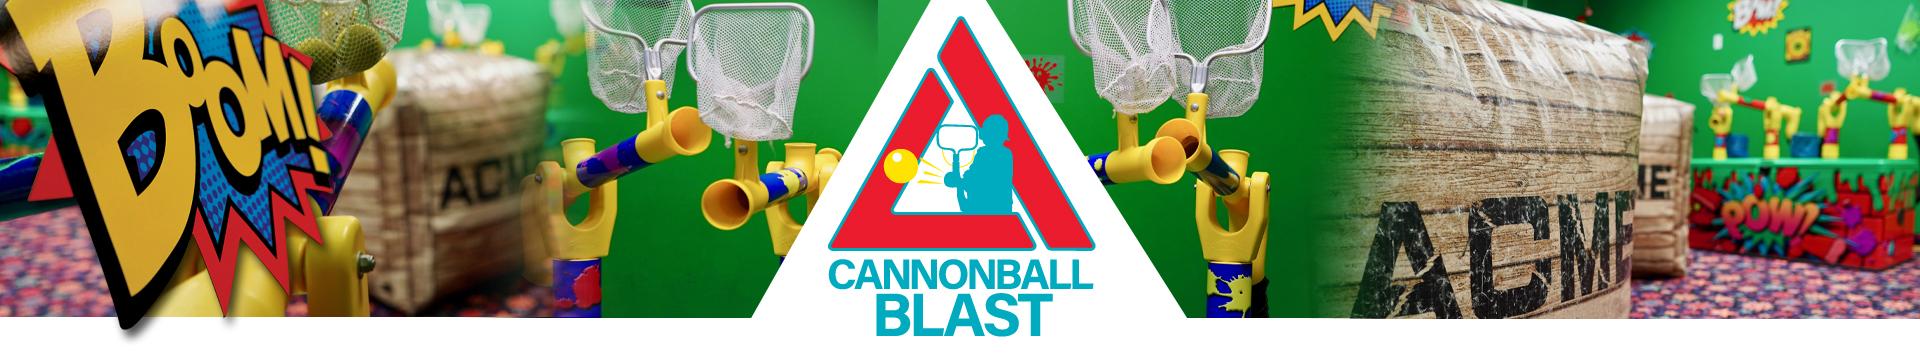 activekidz cannonball blast